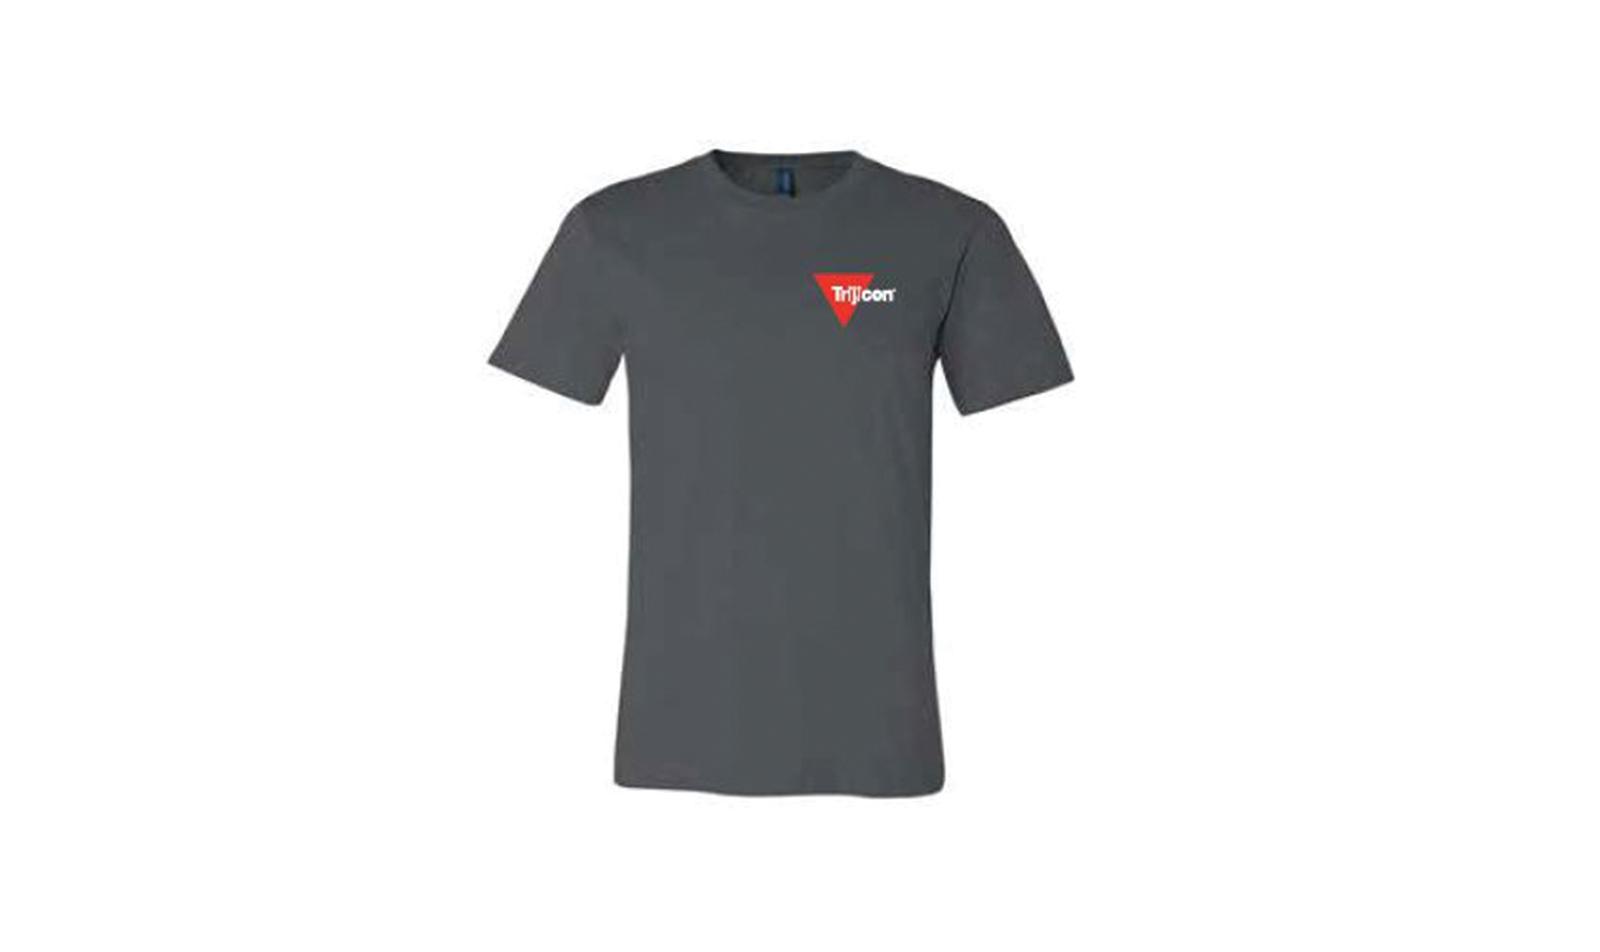 Trijicon<sup>®</sup> Jersey T-Shirt - Gray - 3X